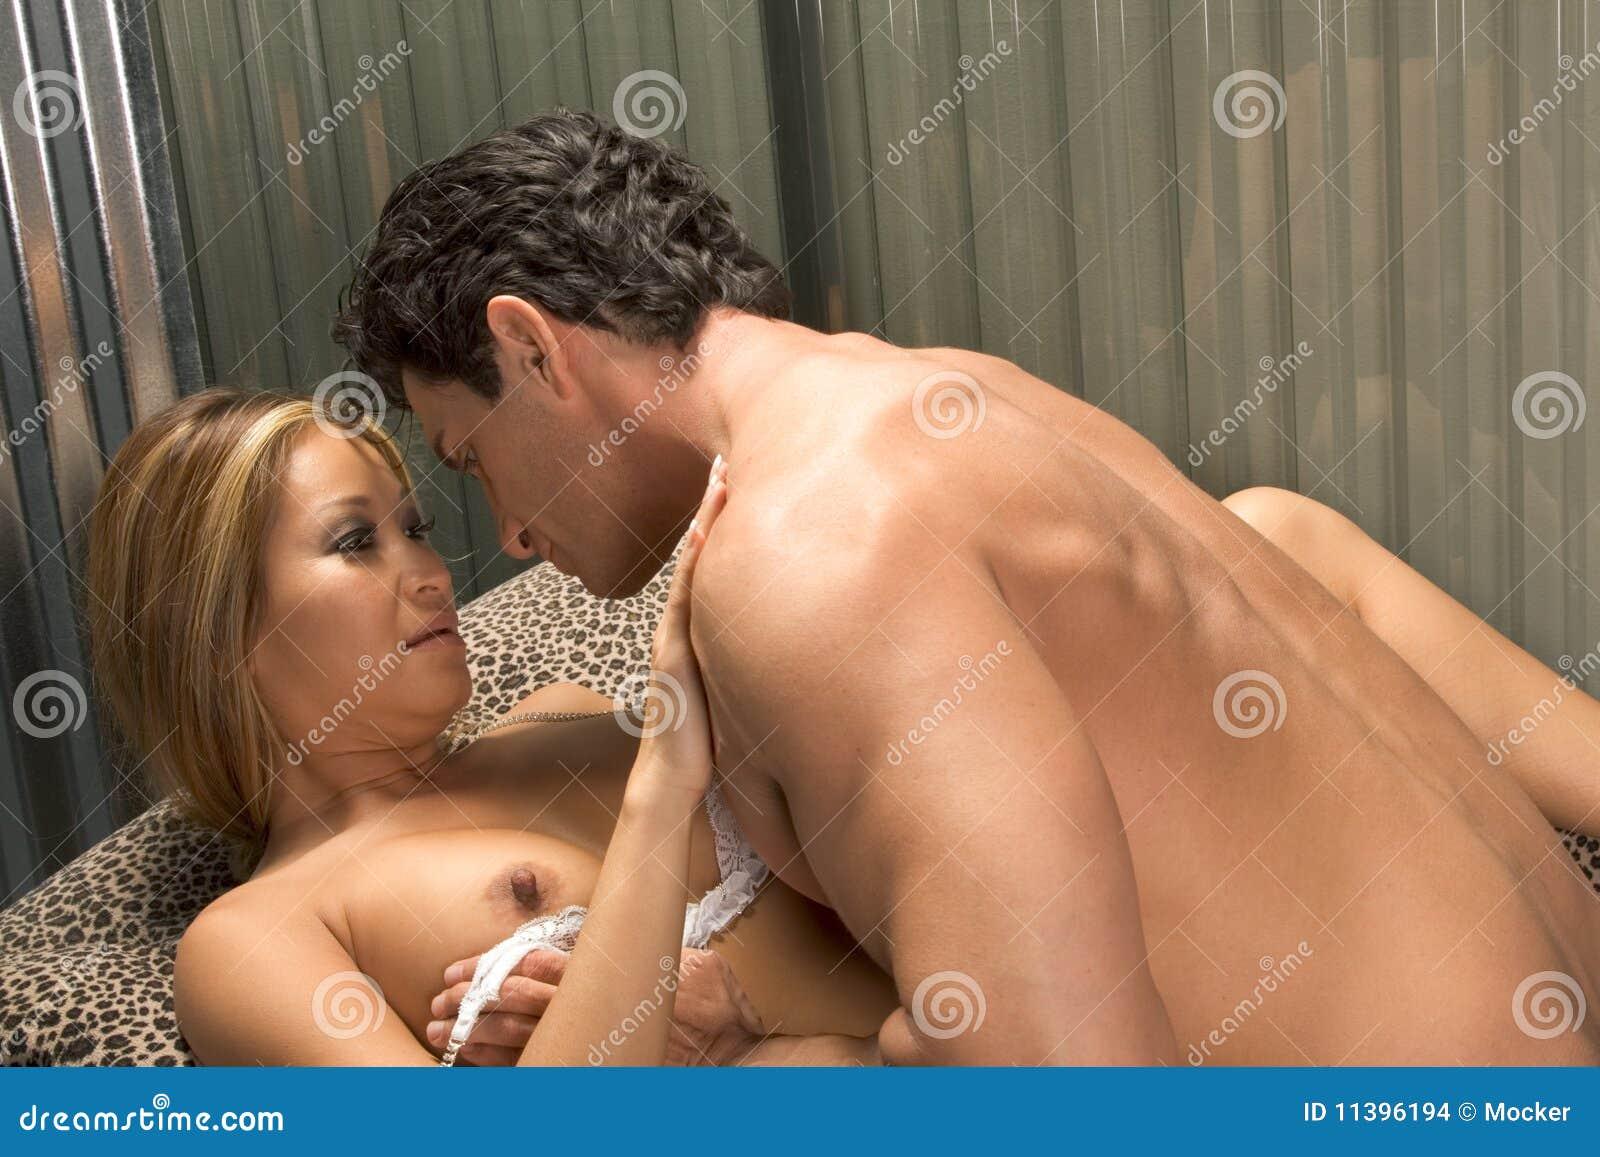 nude teen girls face down